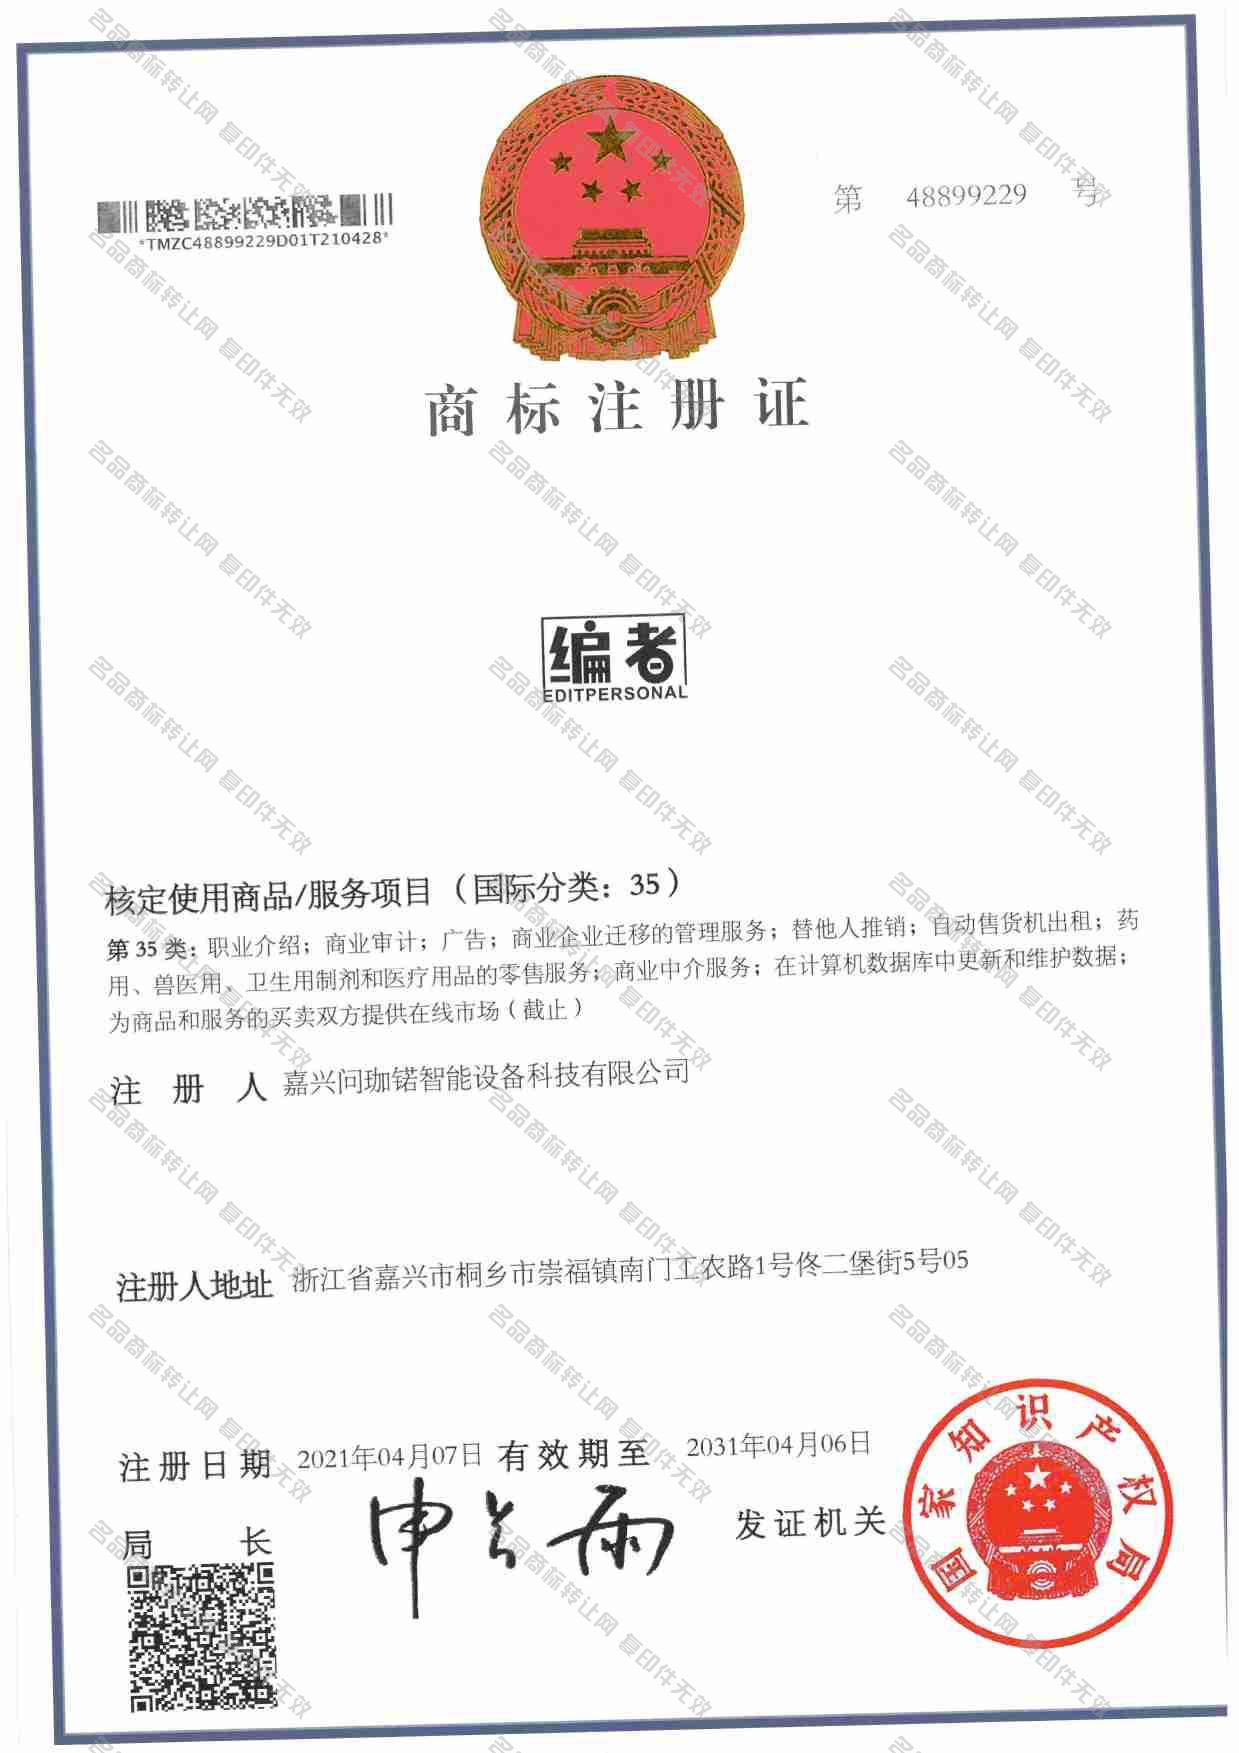 编者 EDITPERSONAL注册证